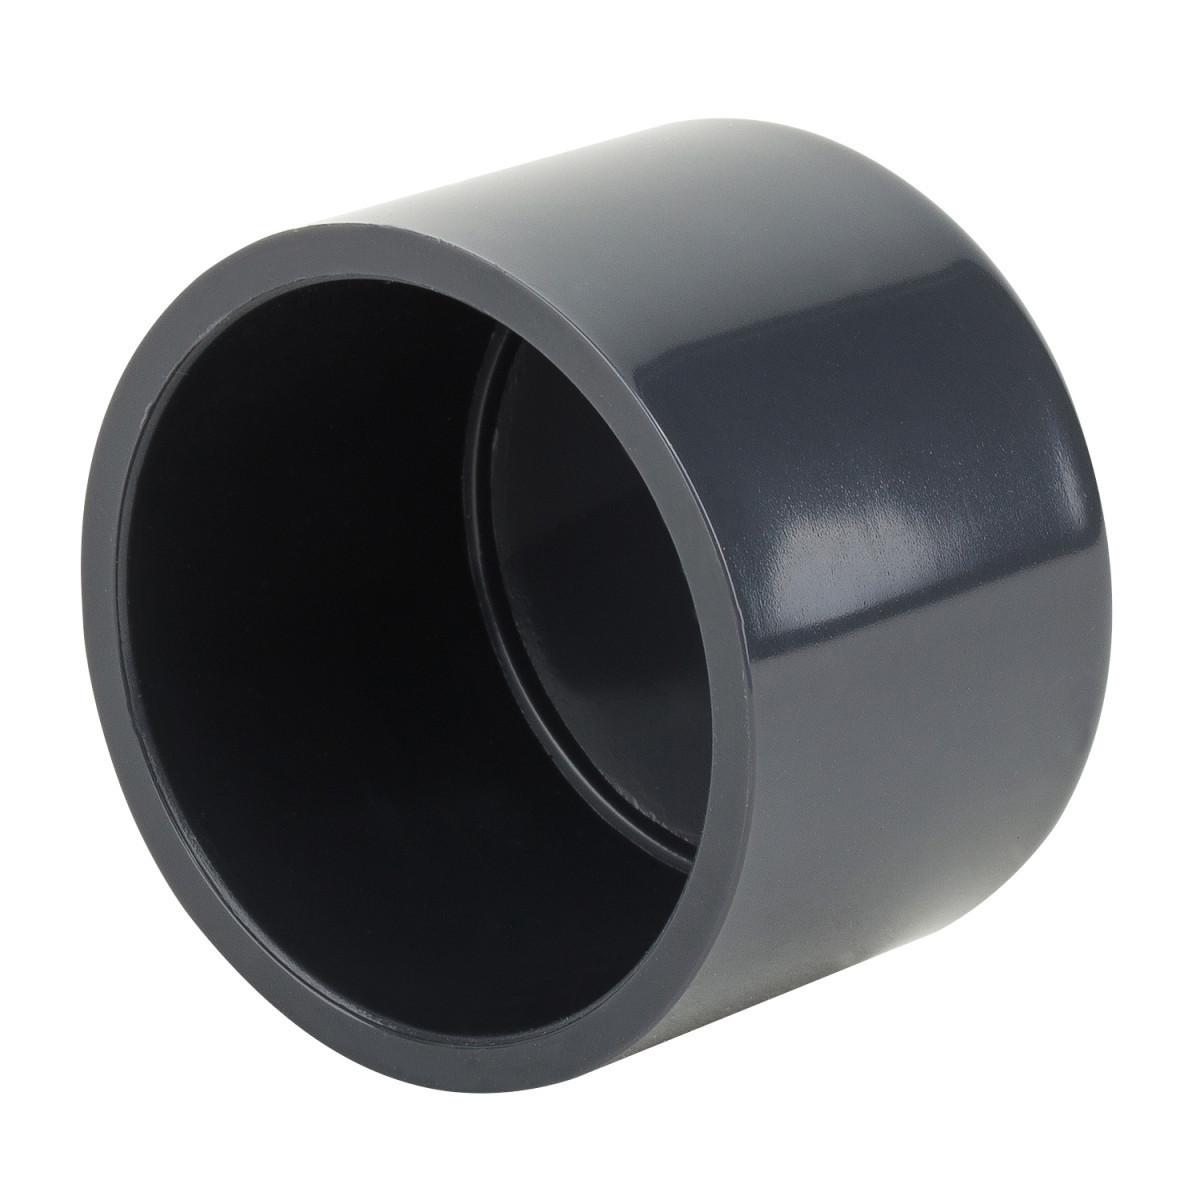 Заглушка ПВХ ERA клеевая, диаметр 32 мм.